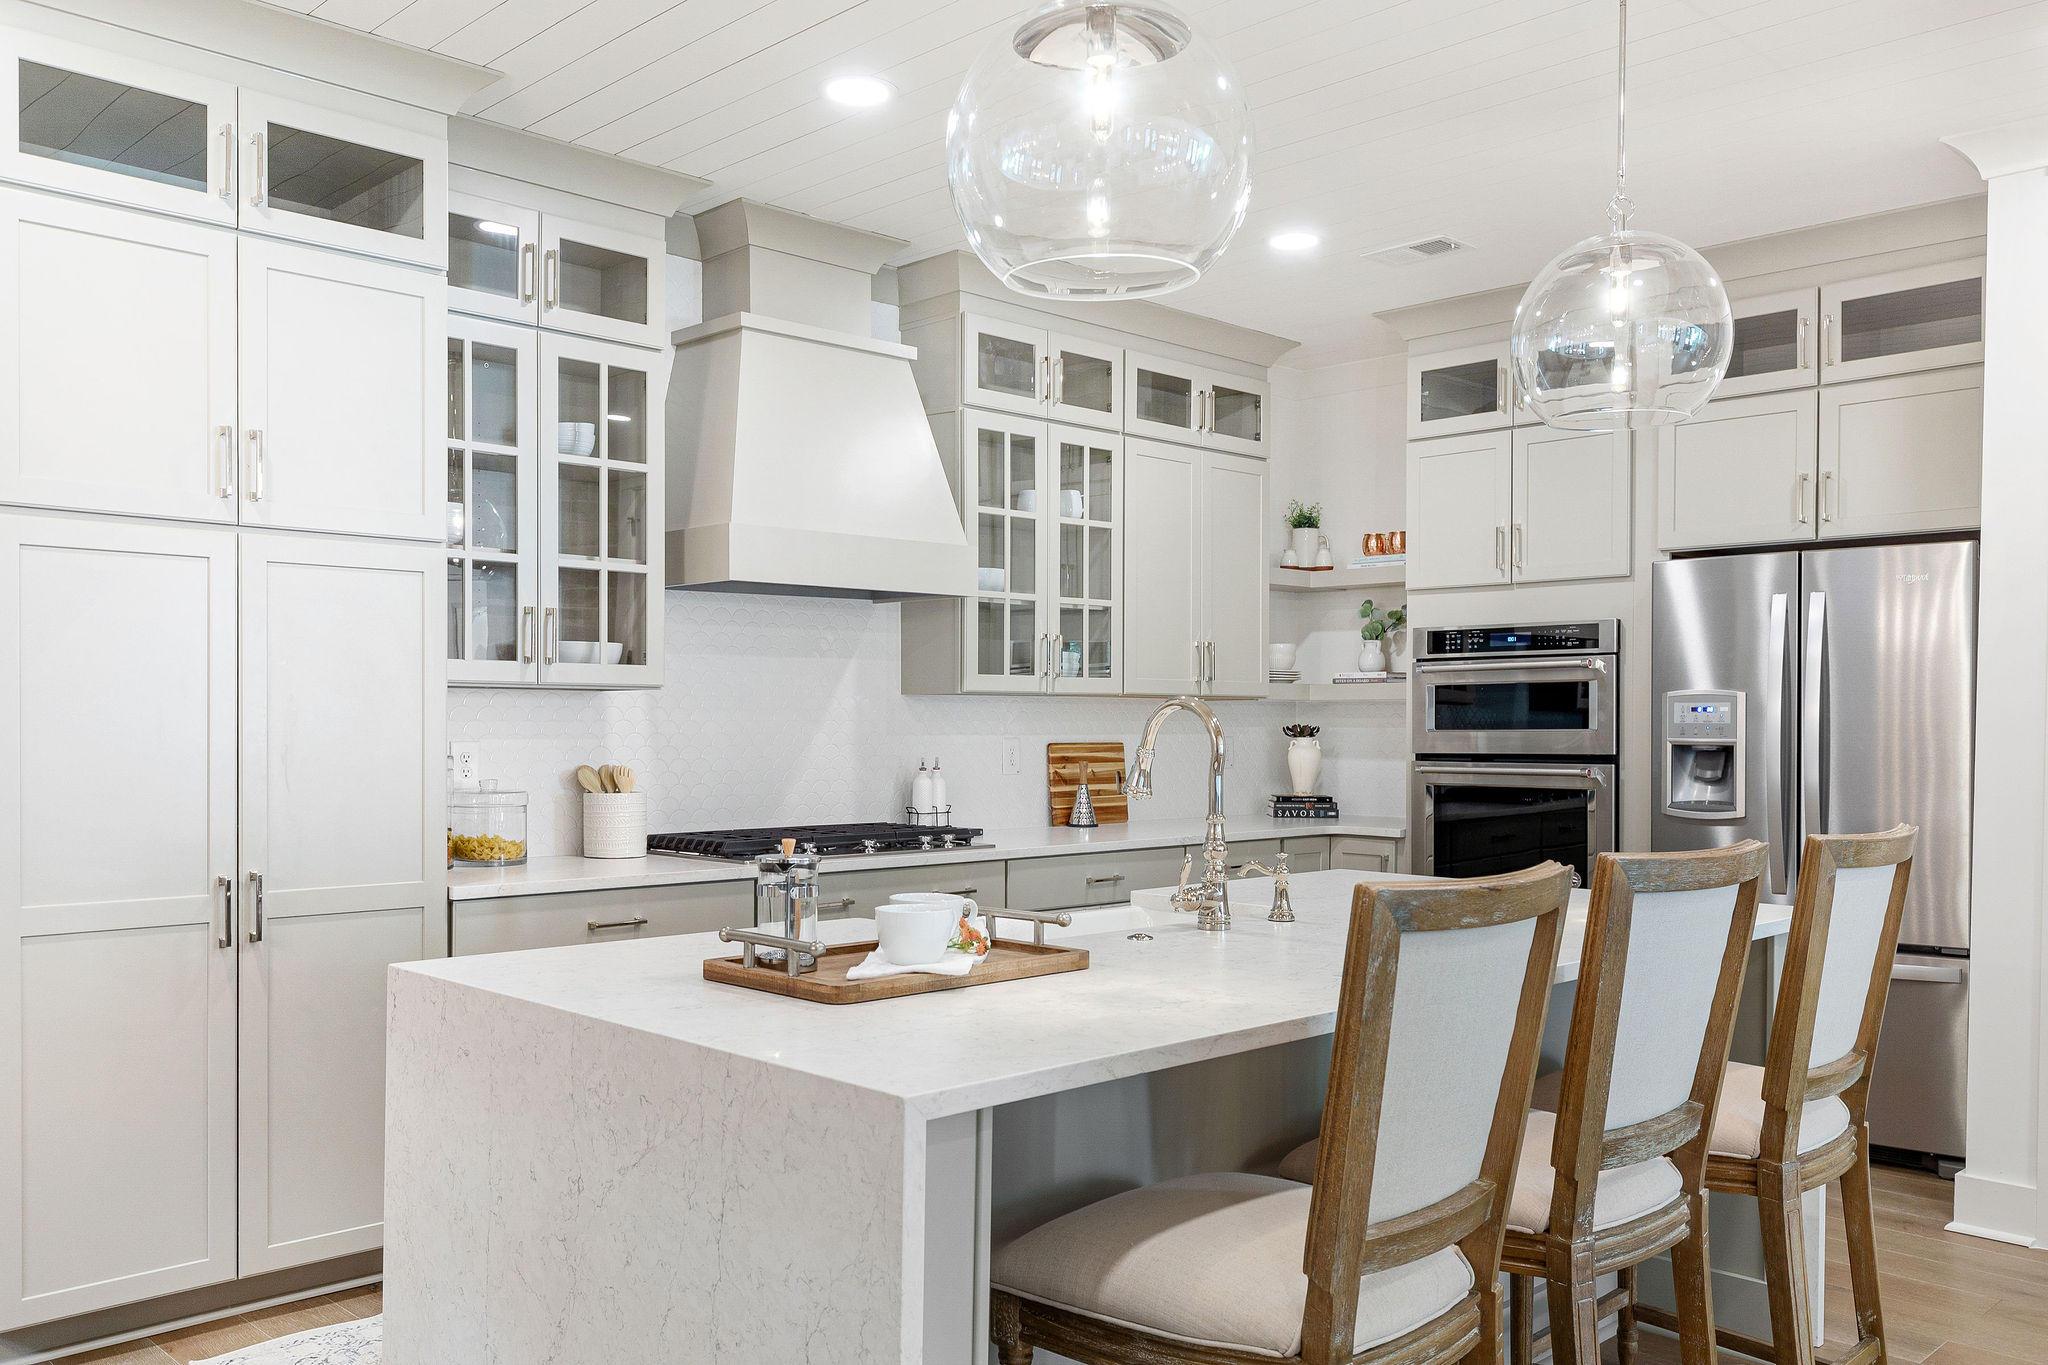 Avenue of Oaks Homes For Sale - 1027 Avenue Of Oaks, Charleston, SC - 36